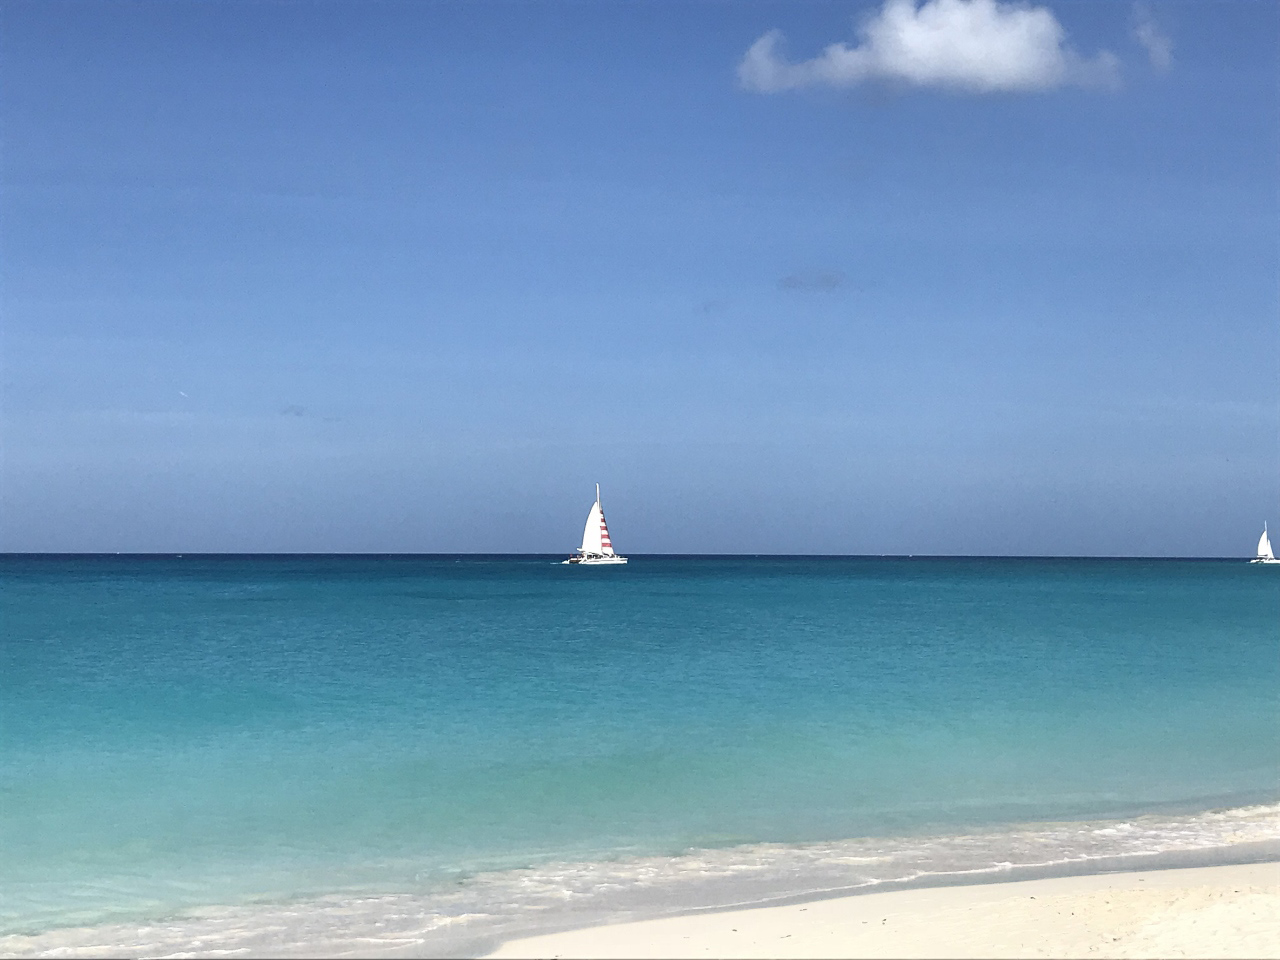 Aruba-The-City-Dweller-28.jpg